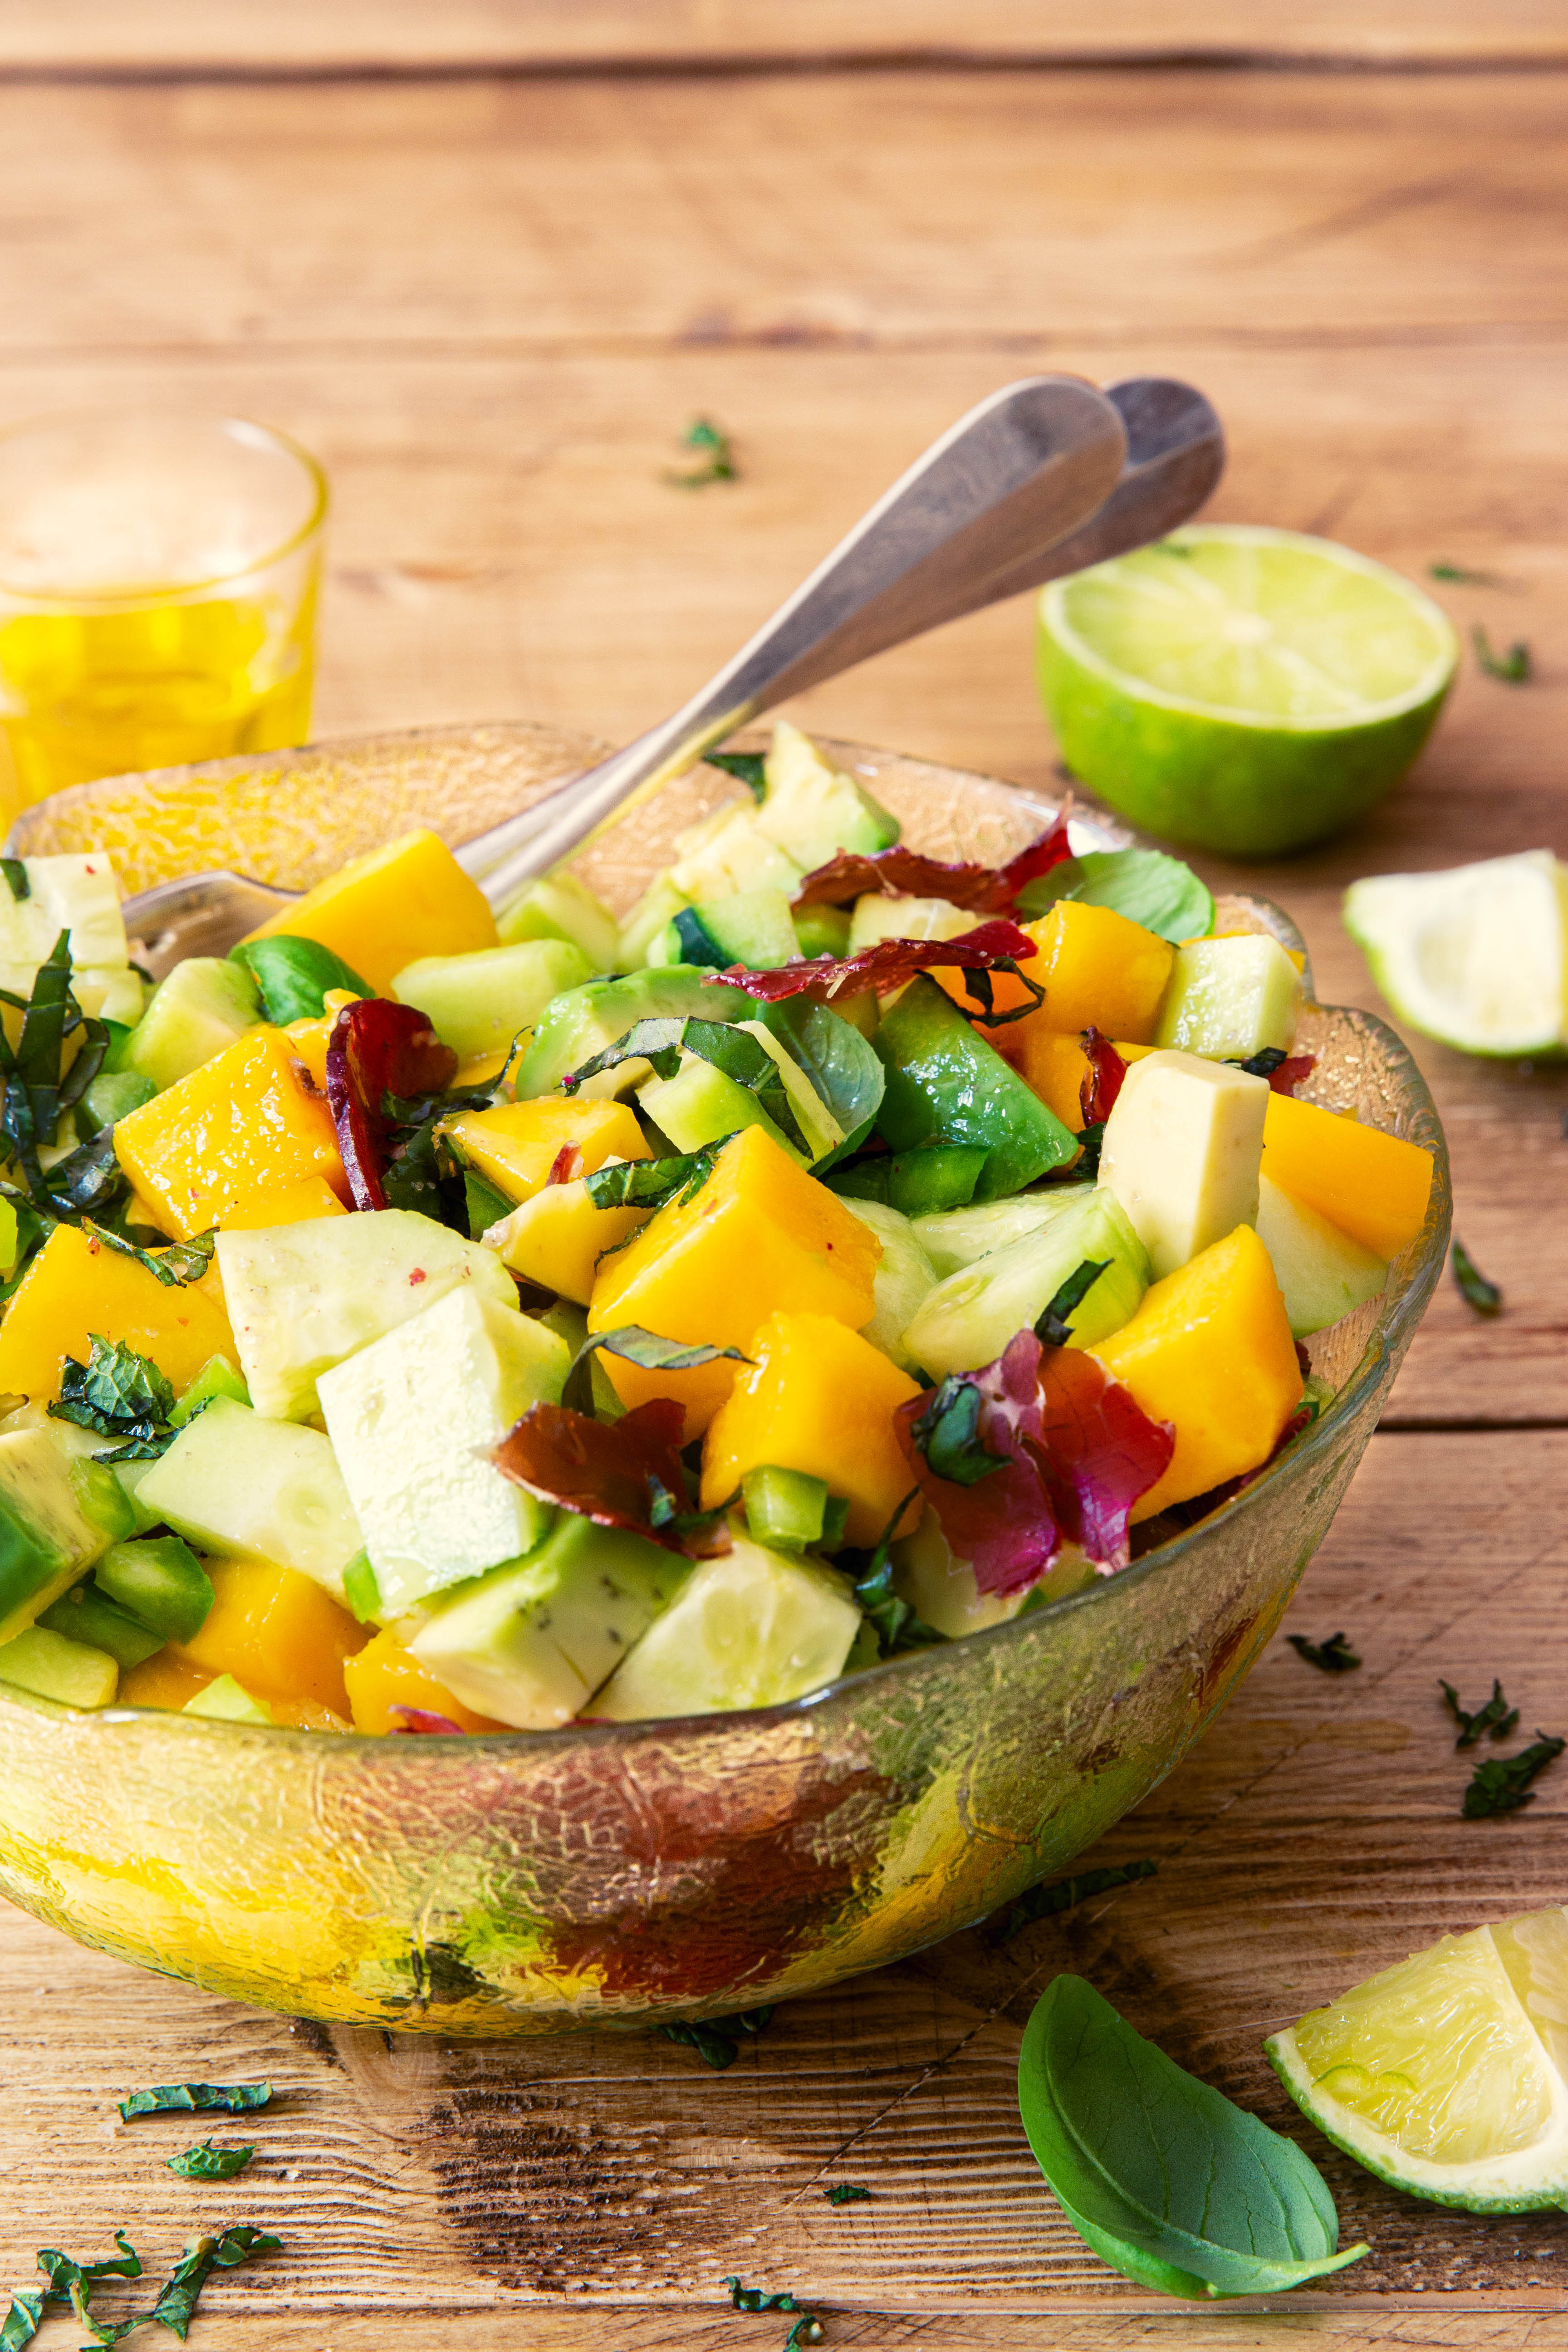 Salade mangue, avocat et bresaola - photography